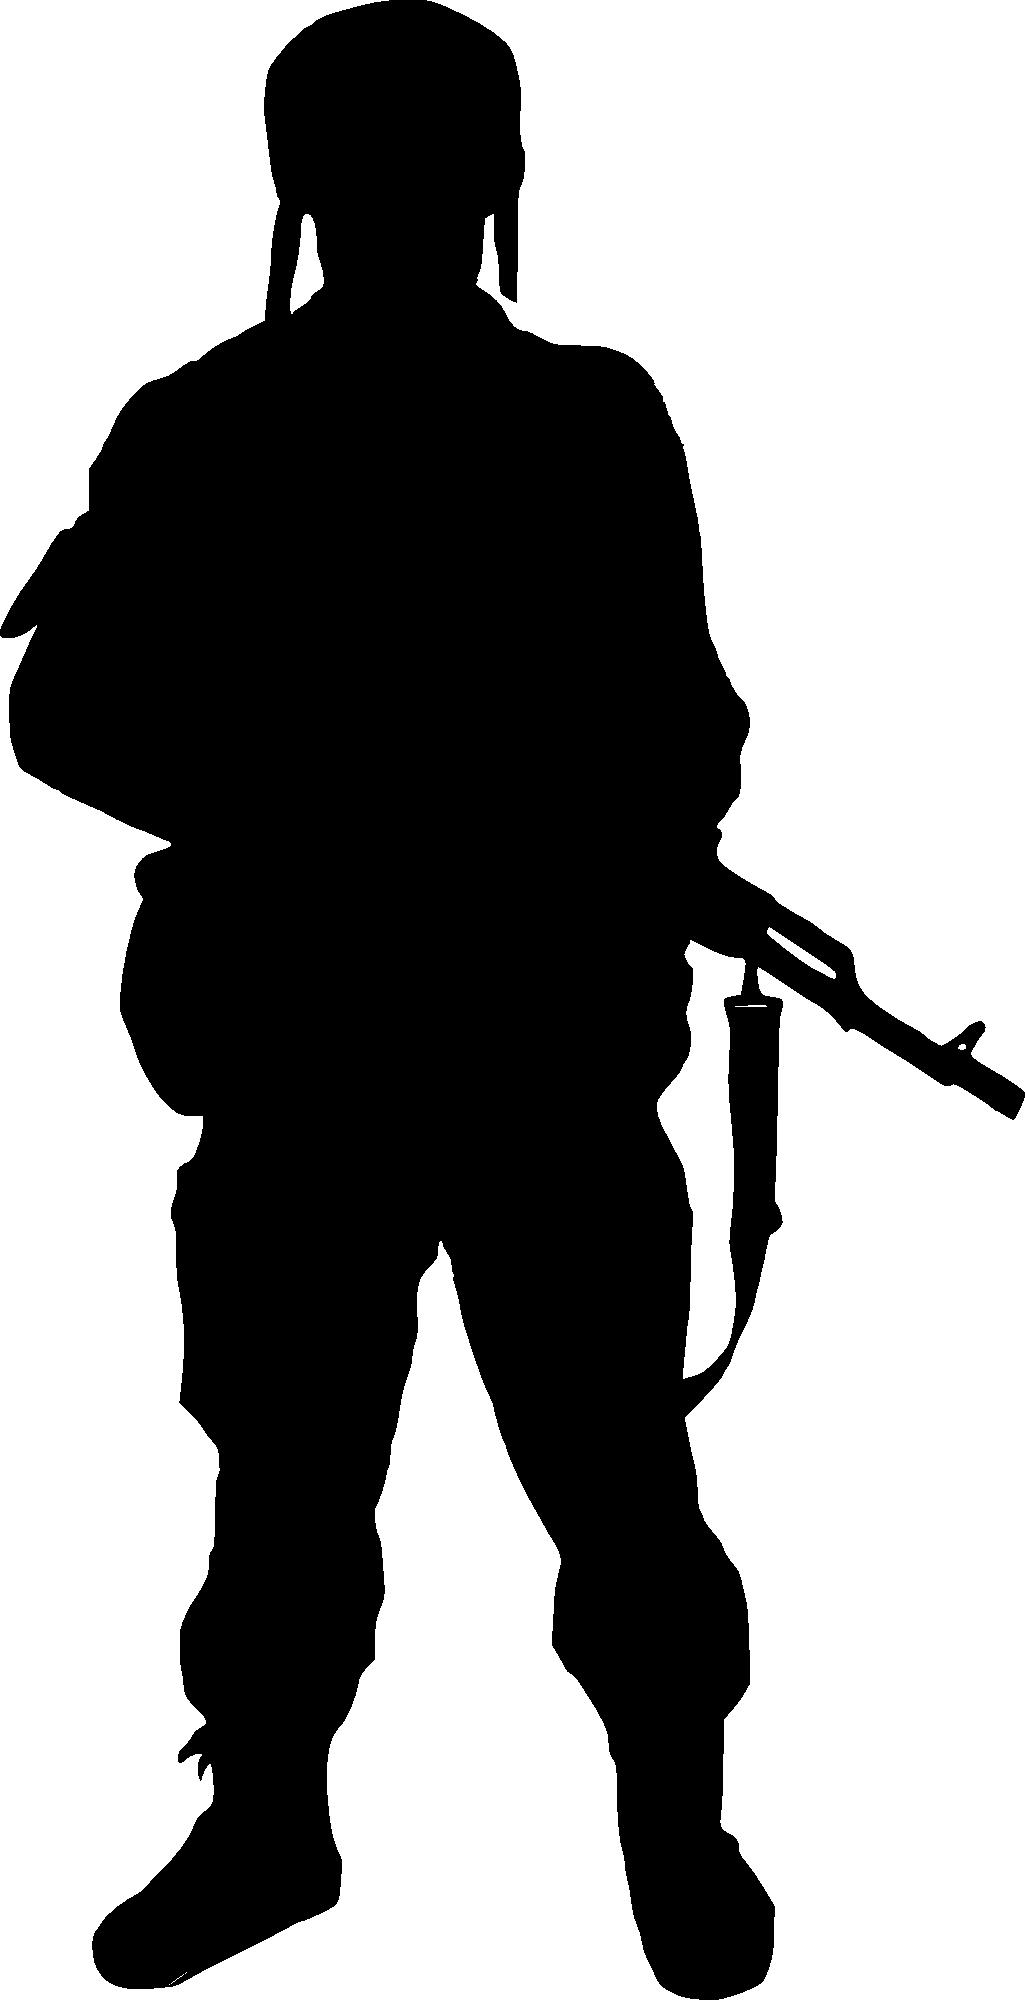 Clipart gun transparent background.  soldier silhouette png